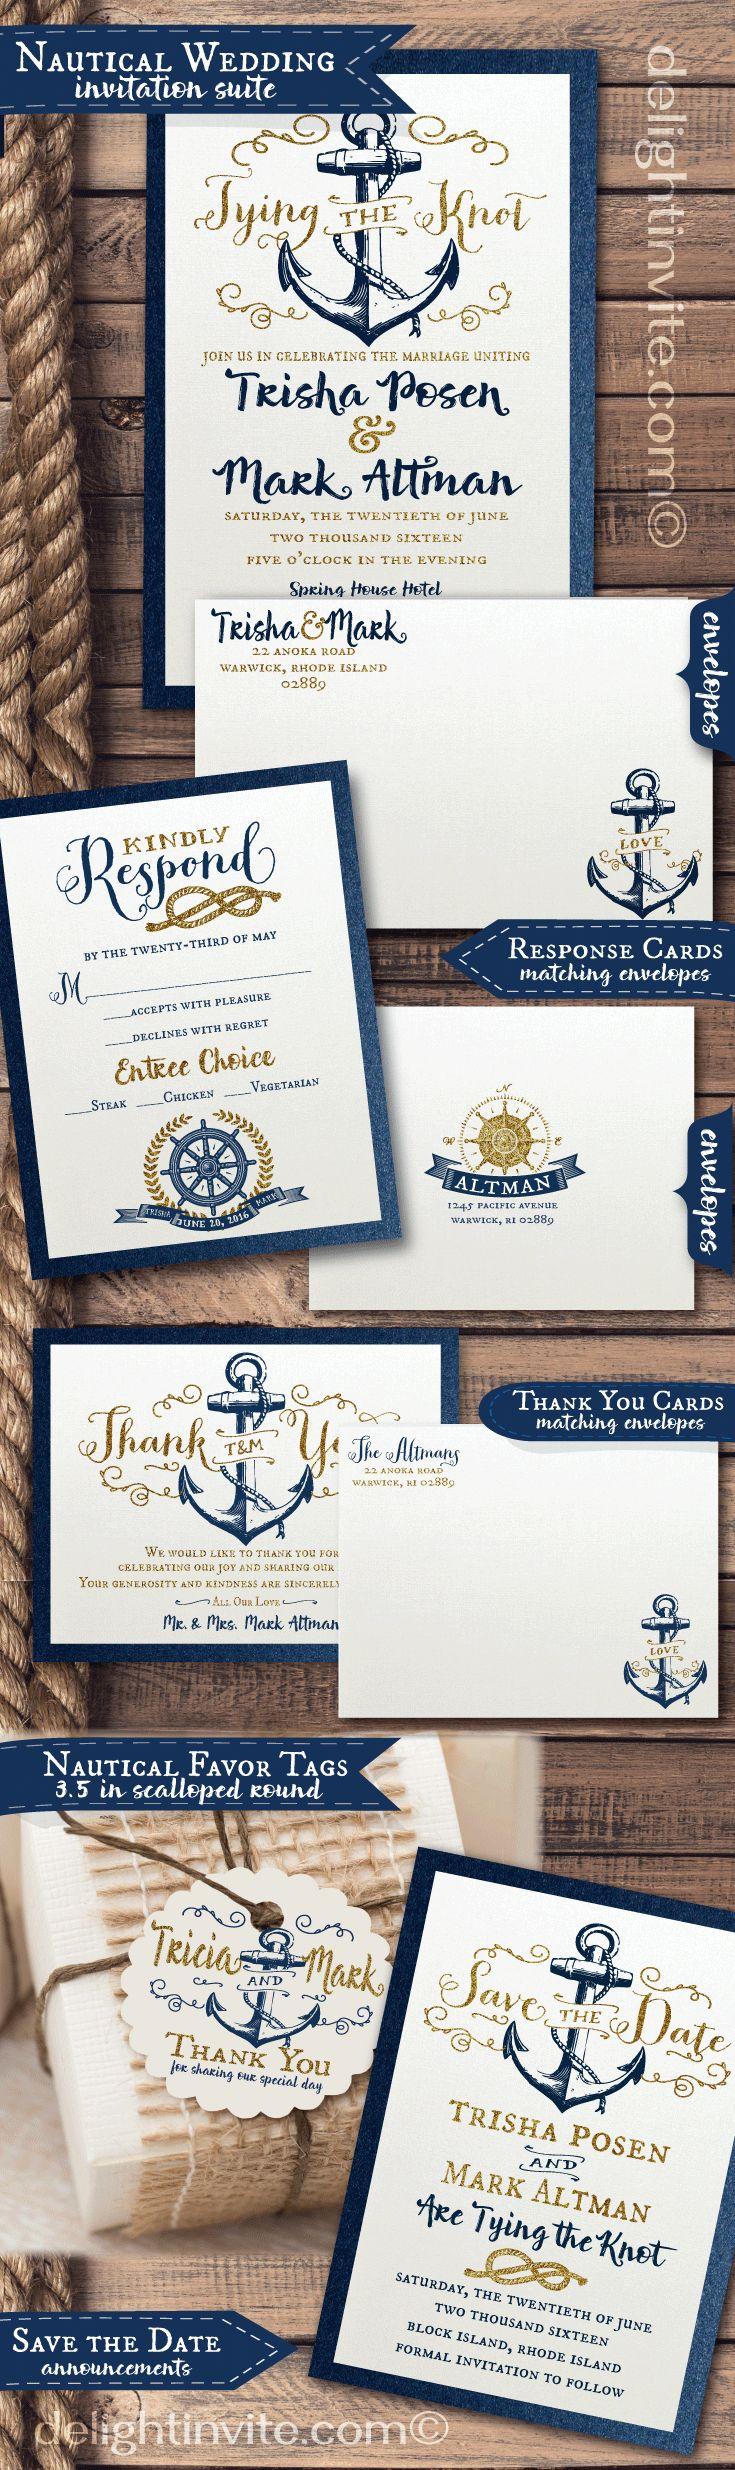 Best 608 Wedding images on Pinterest | Nautical wedding, Sailor ...